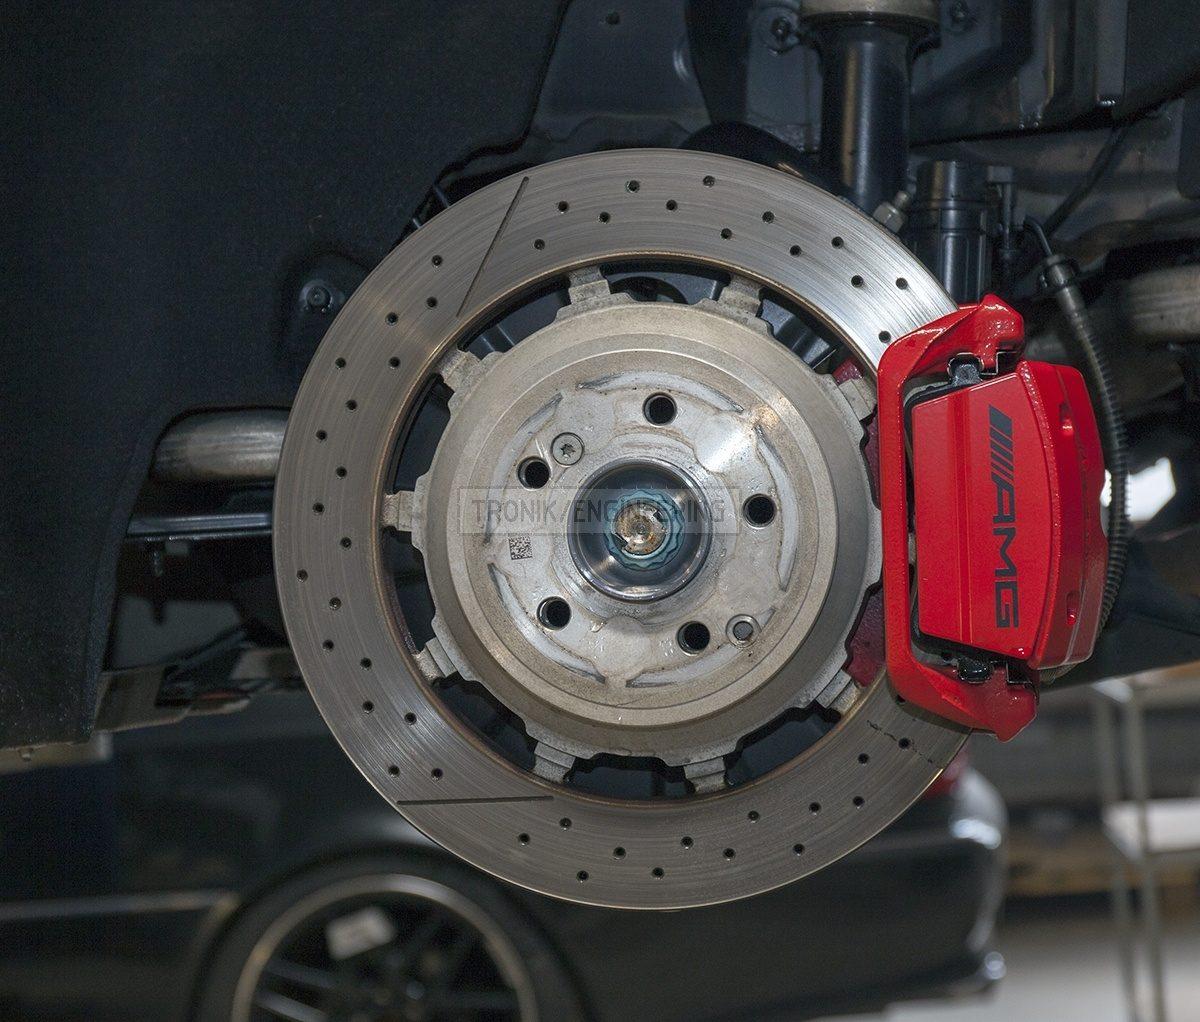 rear brake rotor W222 S63AMG  size 360-26 single pot caliper w/ floating bracket TRW